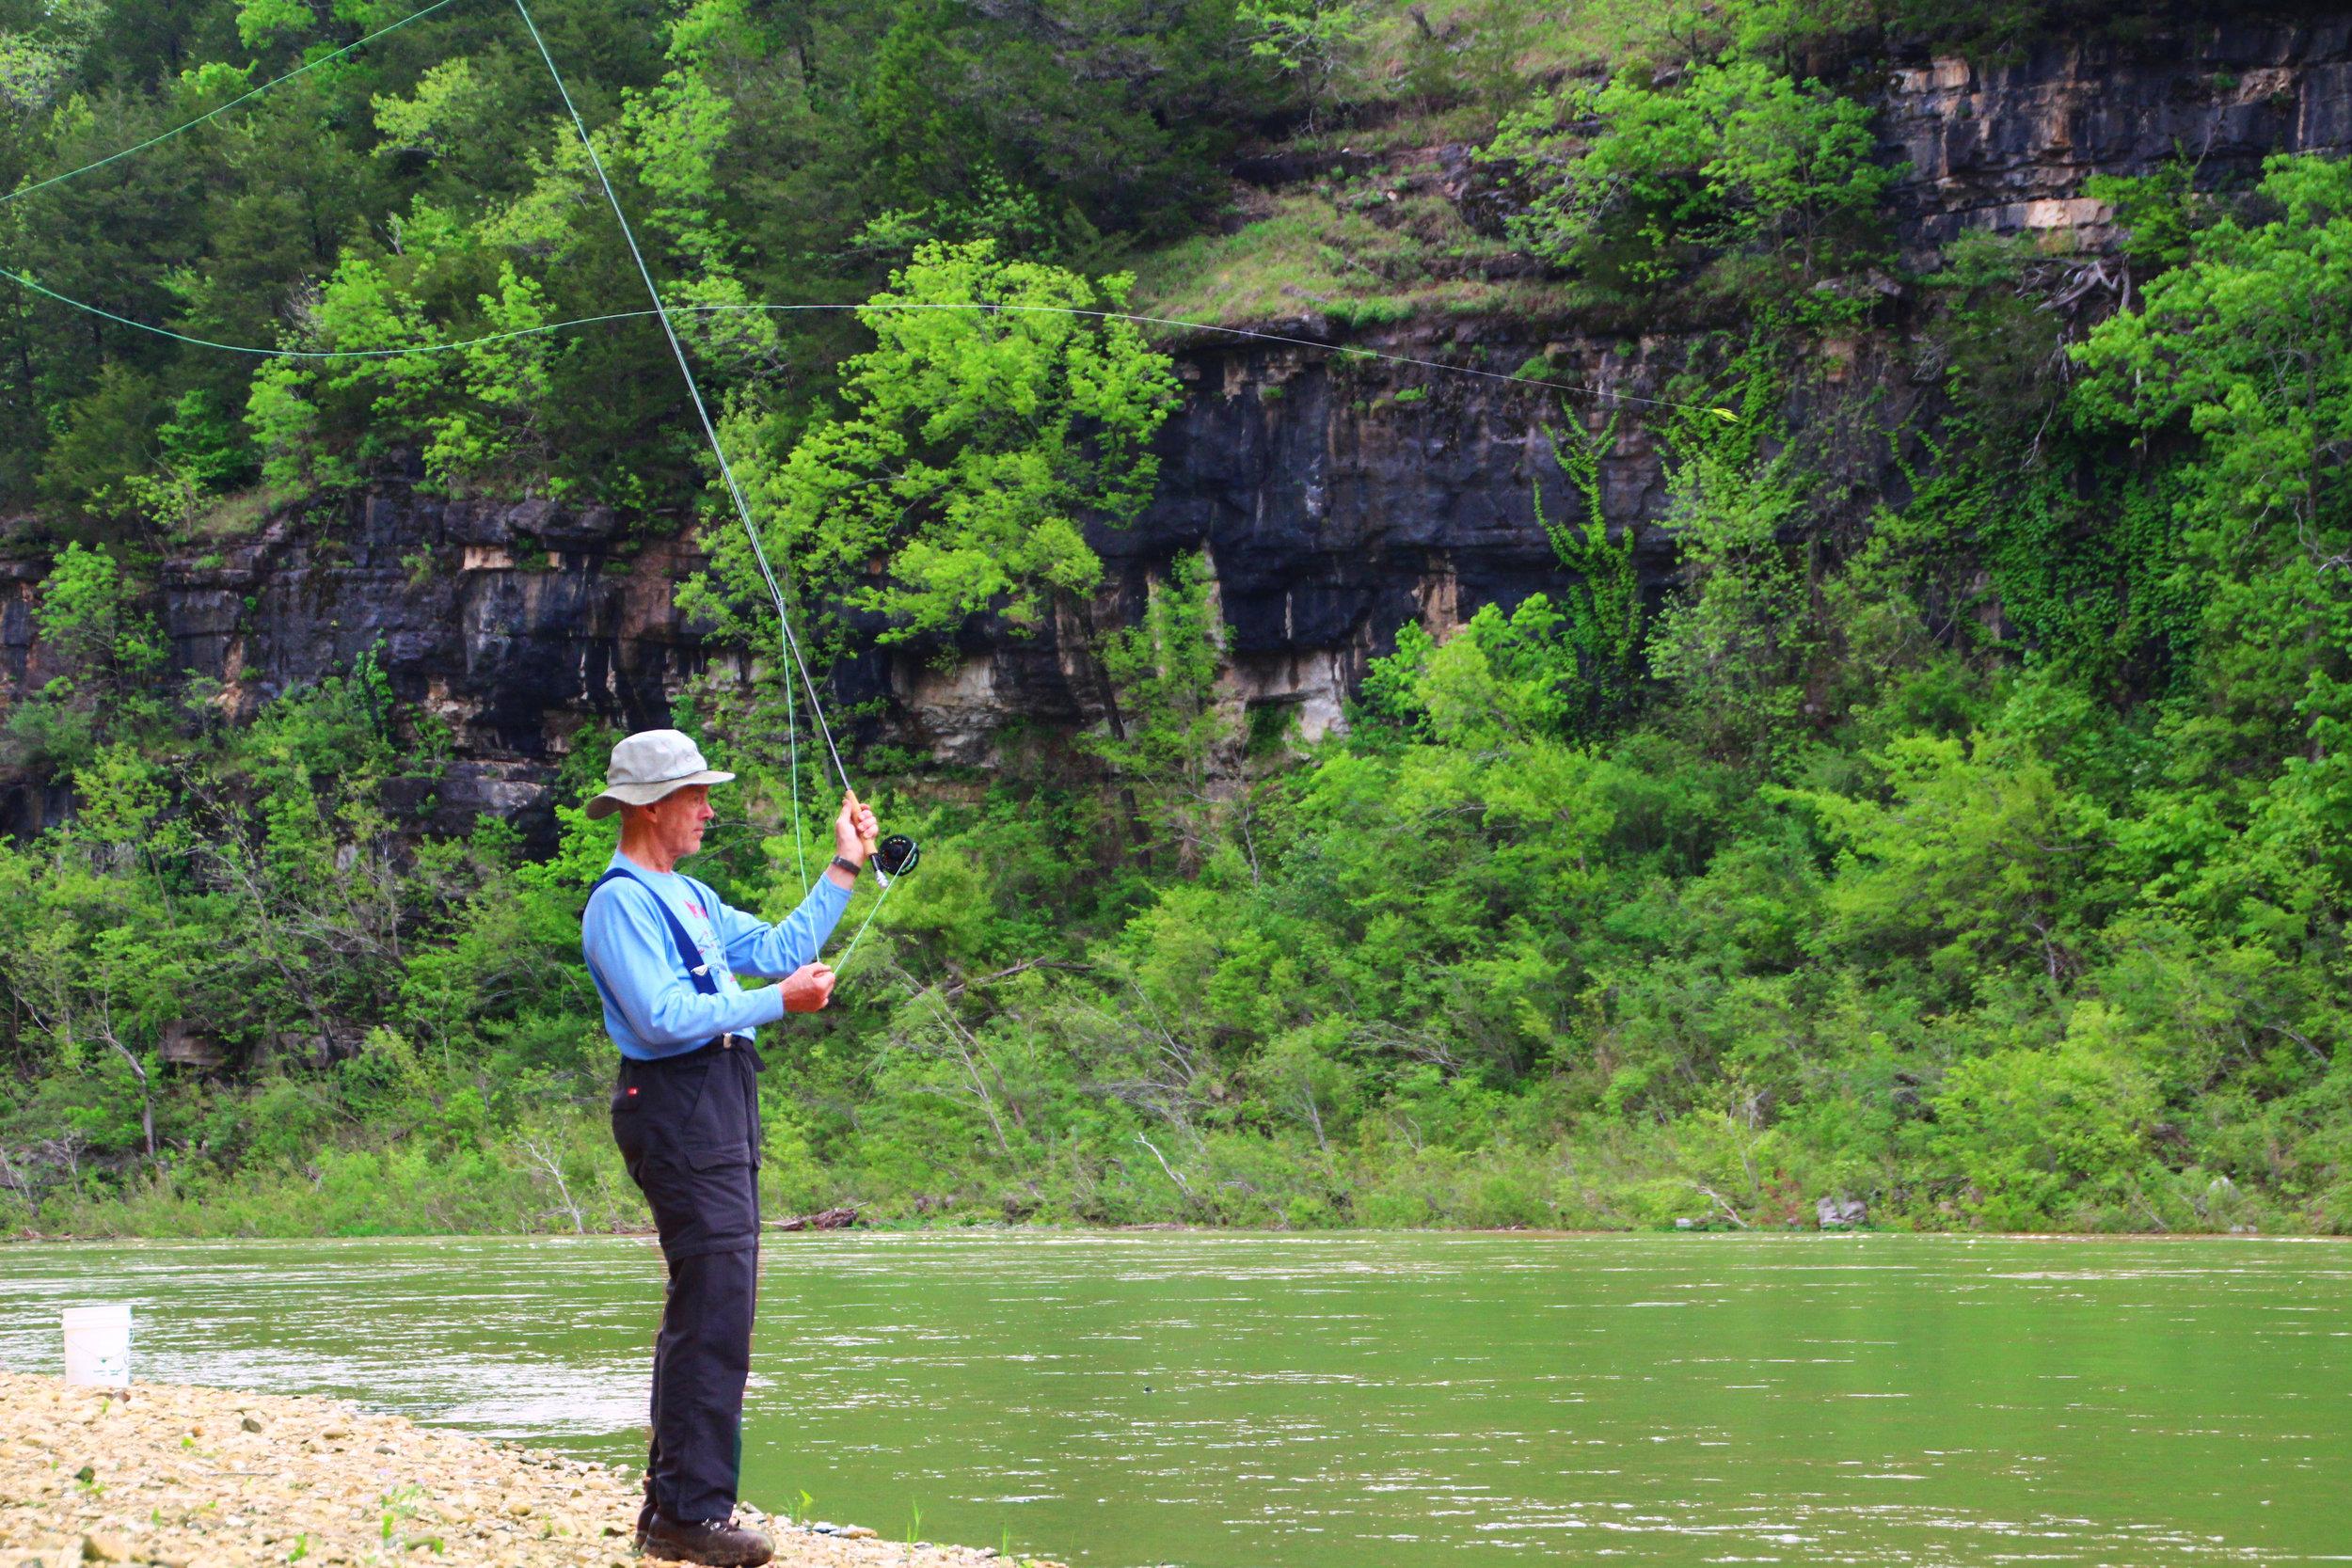 Bill Steward casting a line in the Buffalo River.